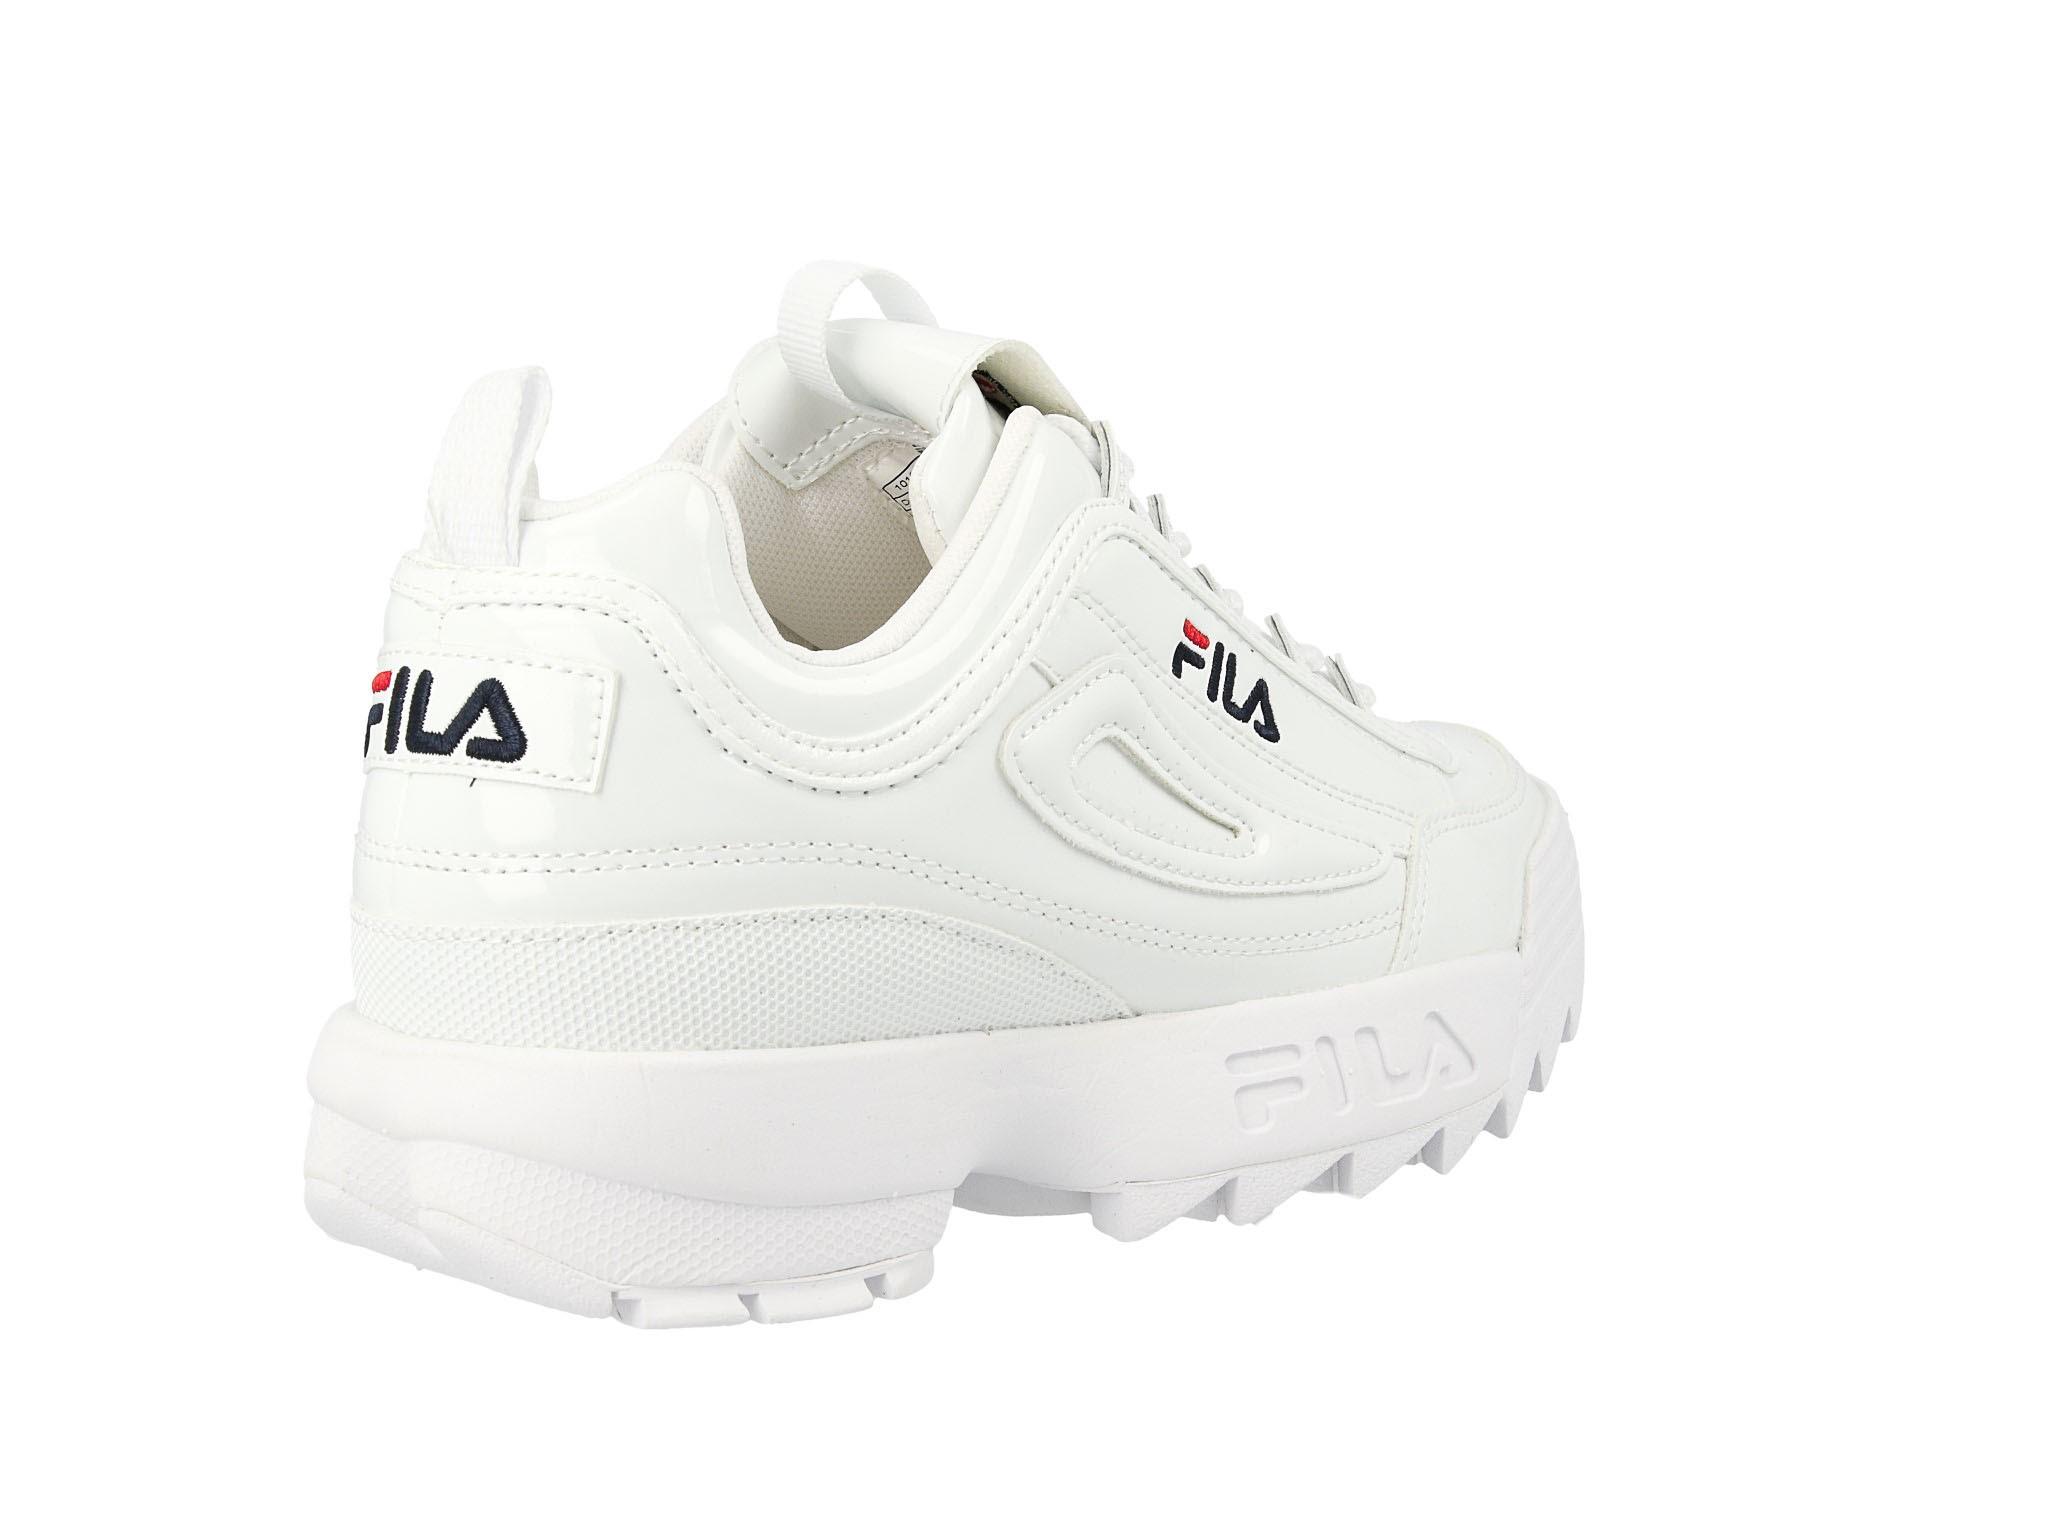 Sneakersy FILA Disruptor P Low Wmn 1010746.1FG White